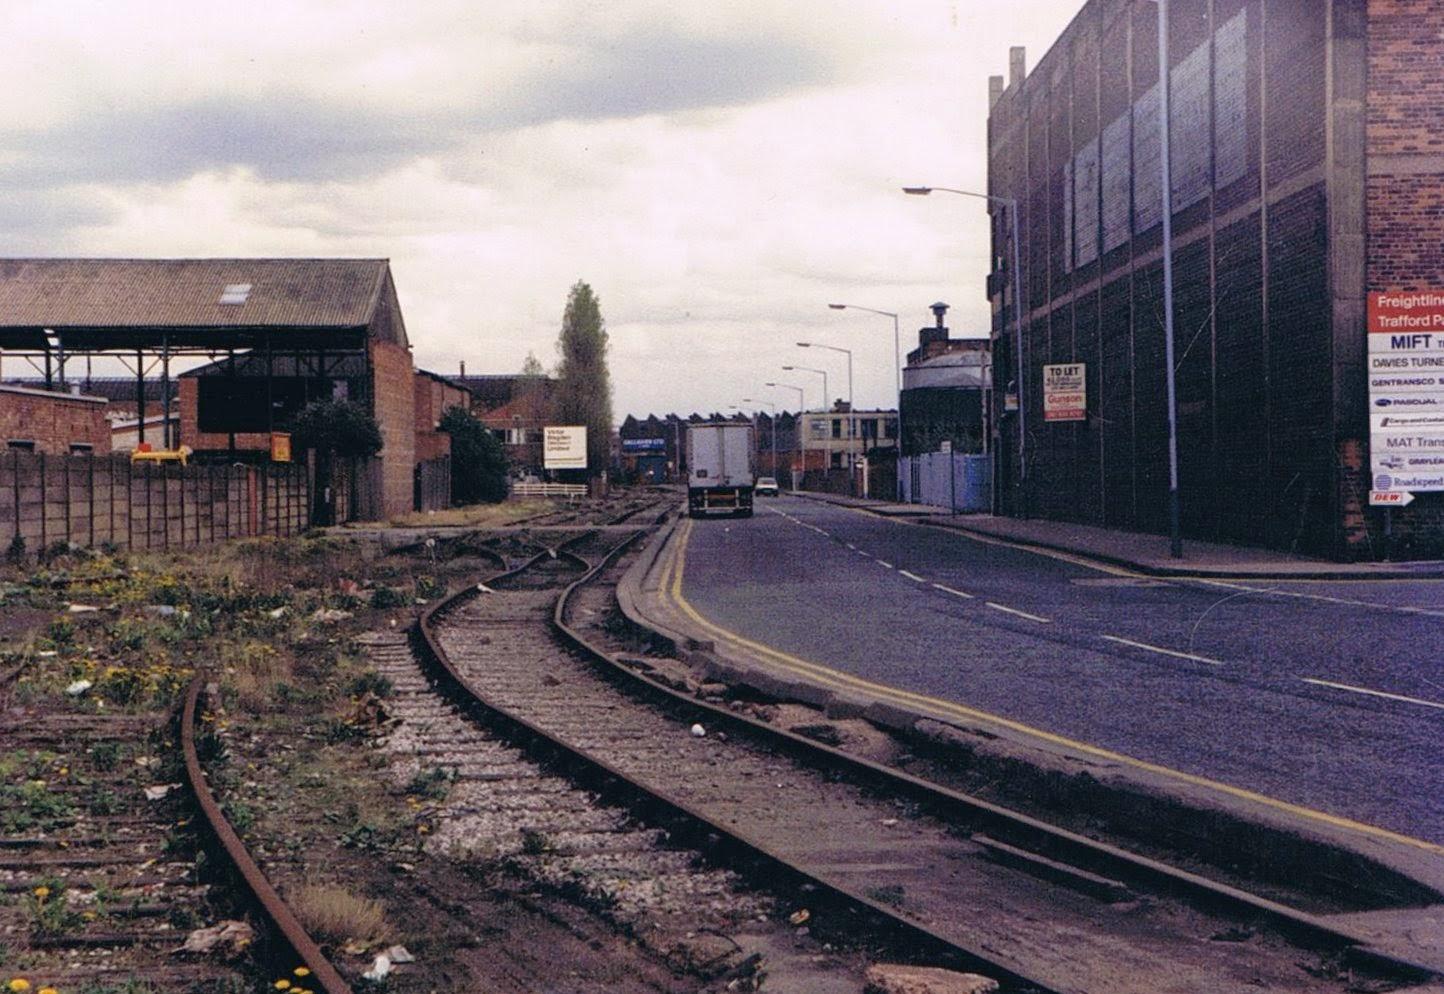 The Rail Thing Trafford Park